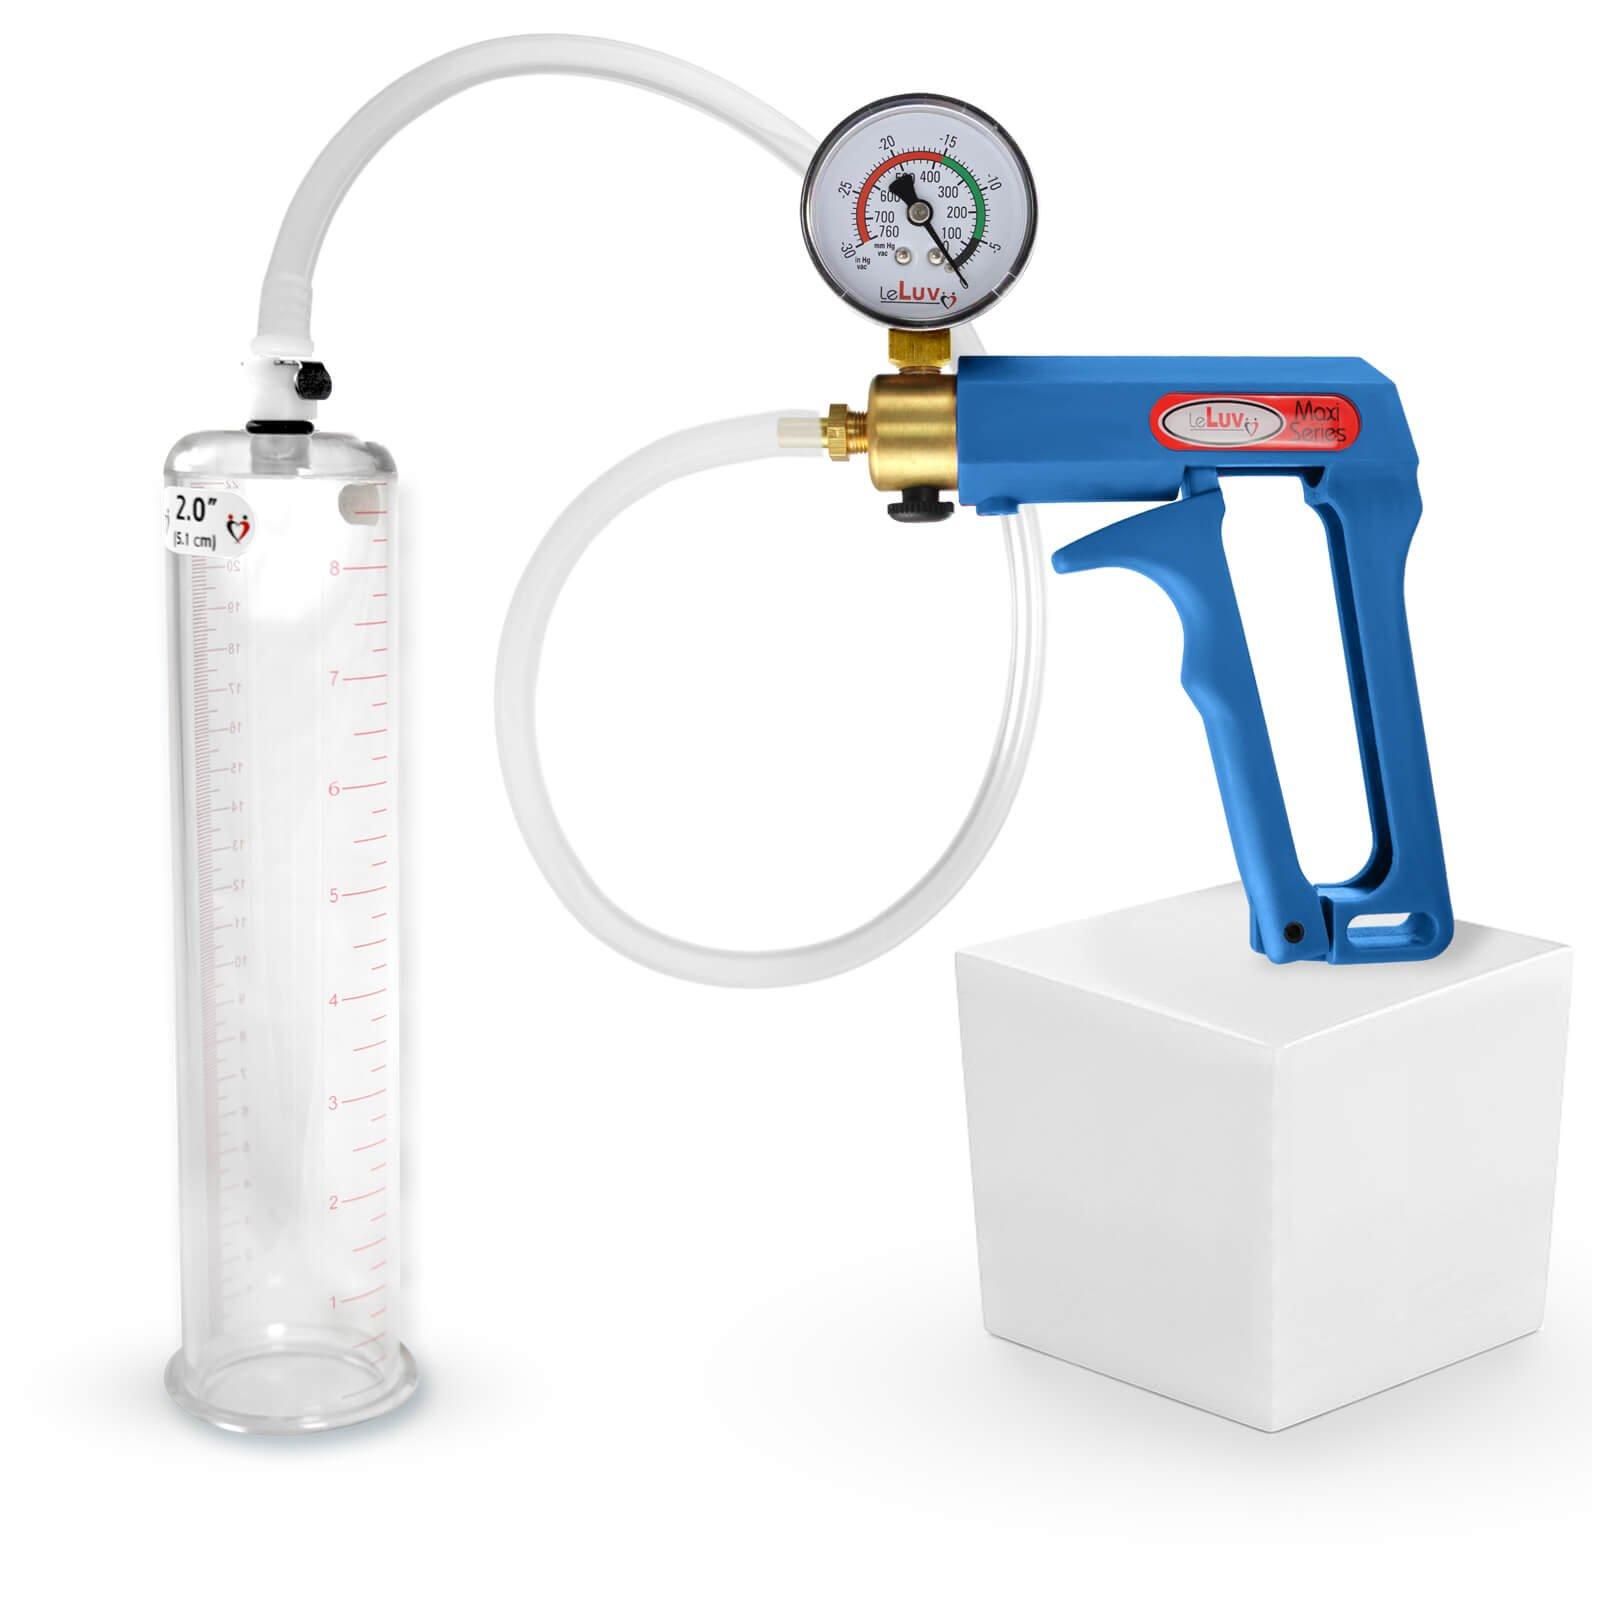 LeLuv Maxi Blue Plus Vacuum Gauge Penis Pump 9 inch x 2 inch Cylinder by LeLuv